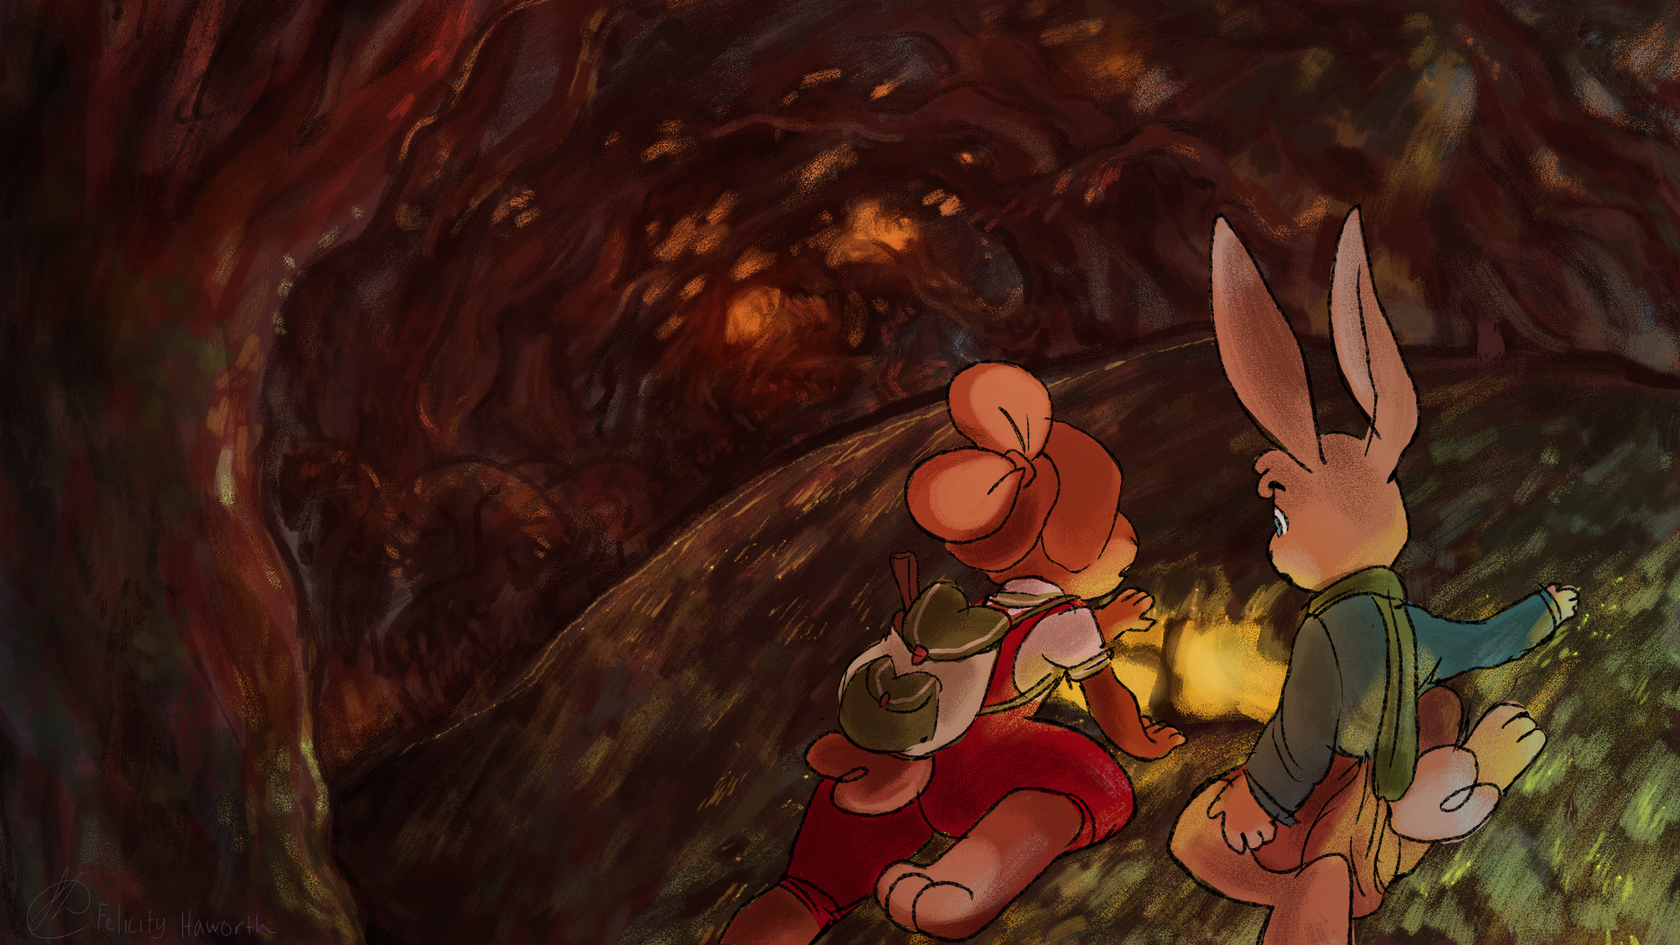 FLOPSY & RABBIT: outside the foxhole